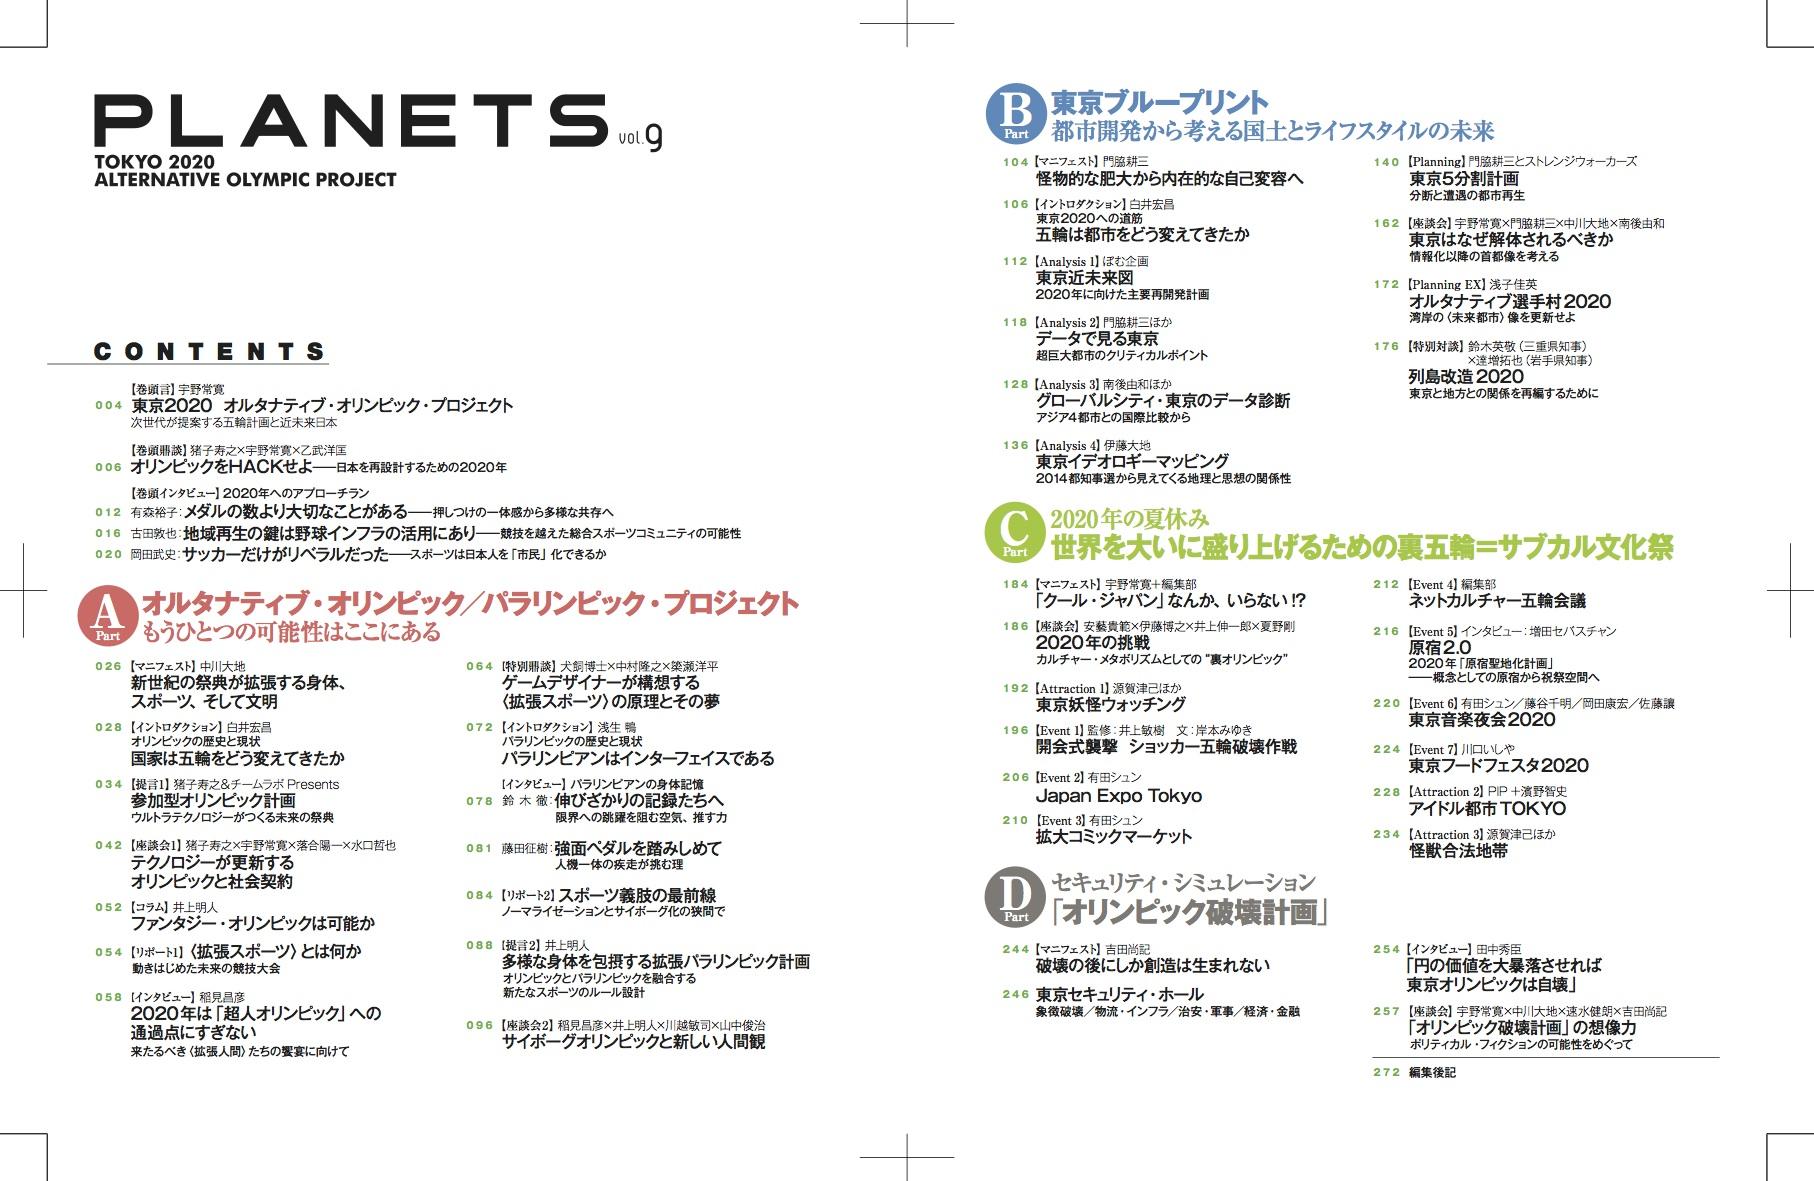 002_003_目次_syusei